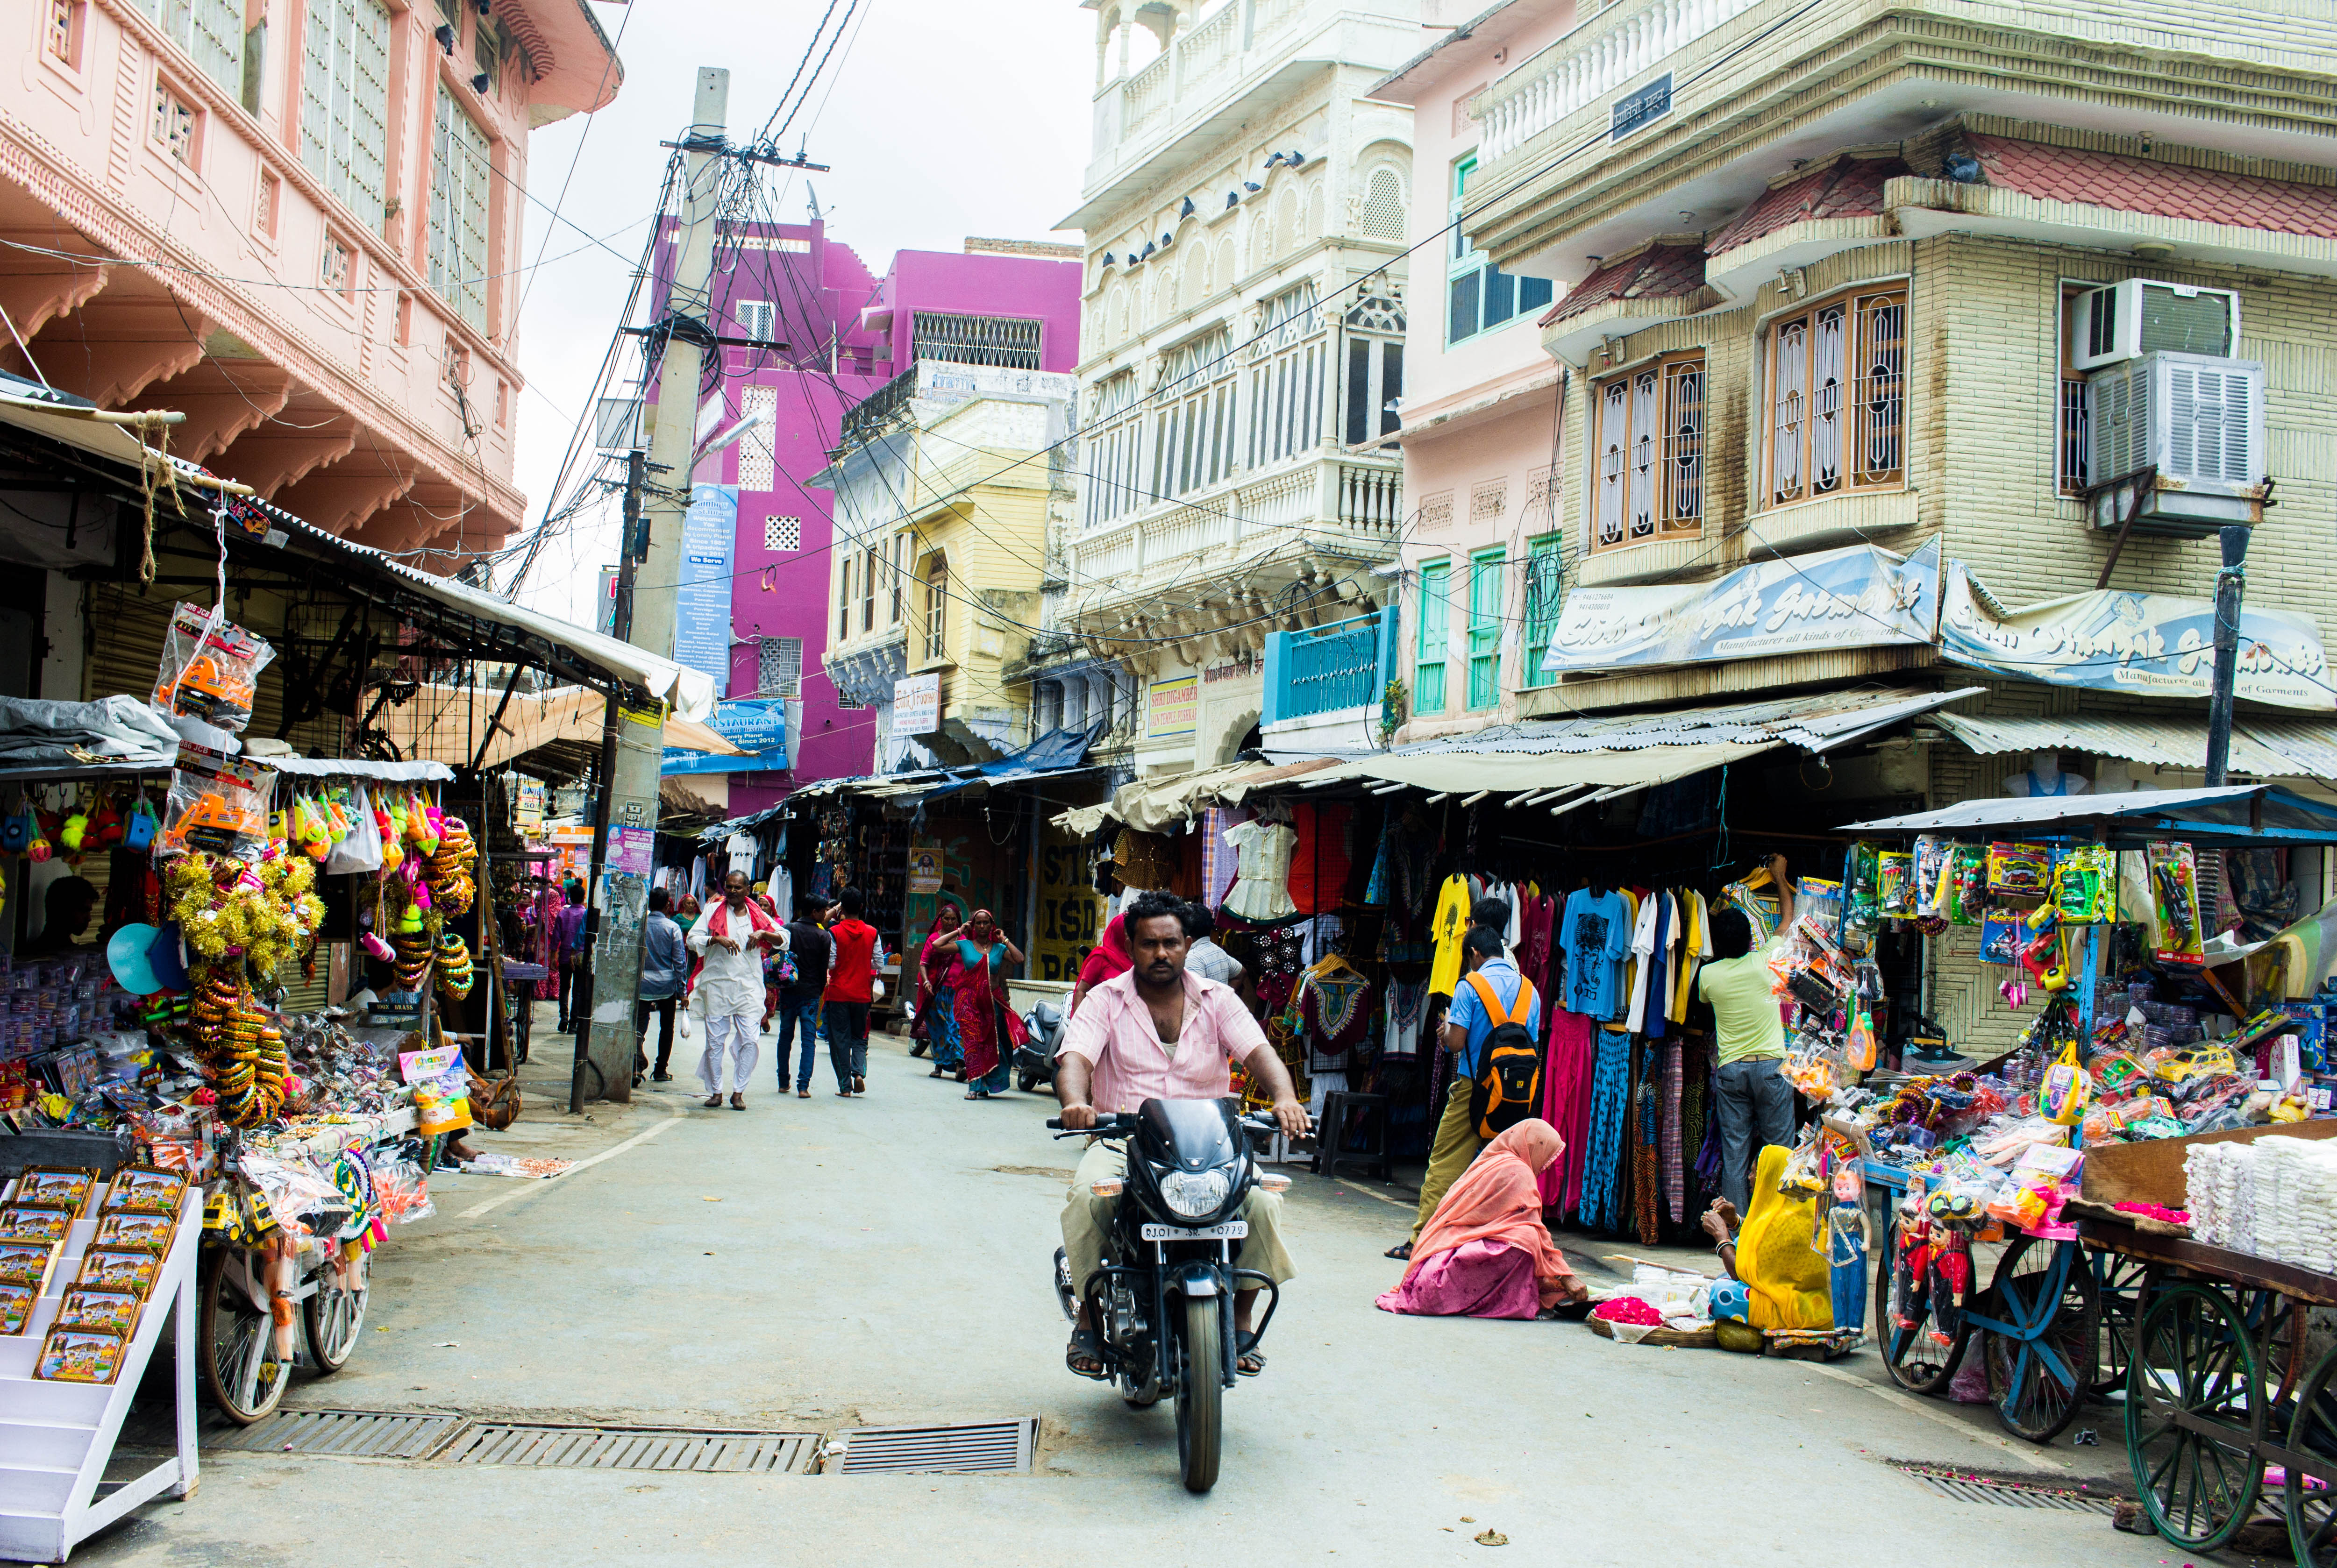 Reasons to put Pushkar on your India bucket list - Kathi Kamleitner - Travelettes (32 of 83)